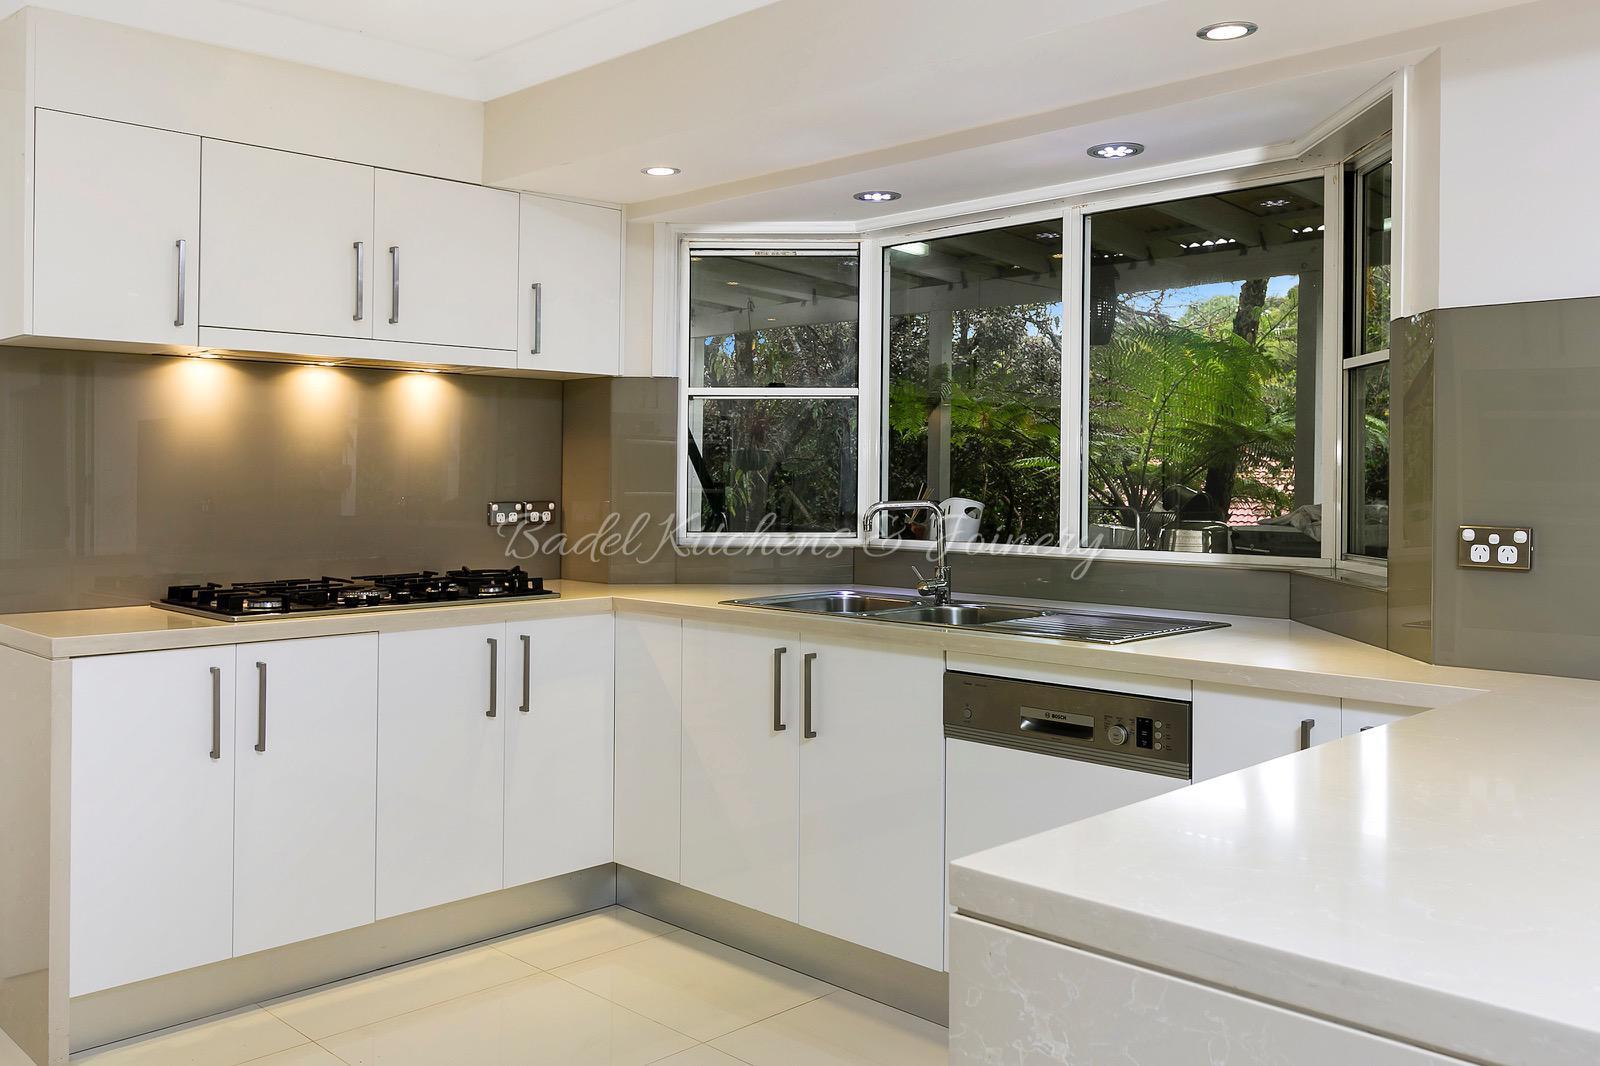 Bathroom Renovation Supplies Castle Hill : Kitchen wardrobe and bathroom renovation castle hill nsw